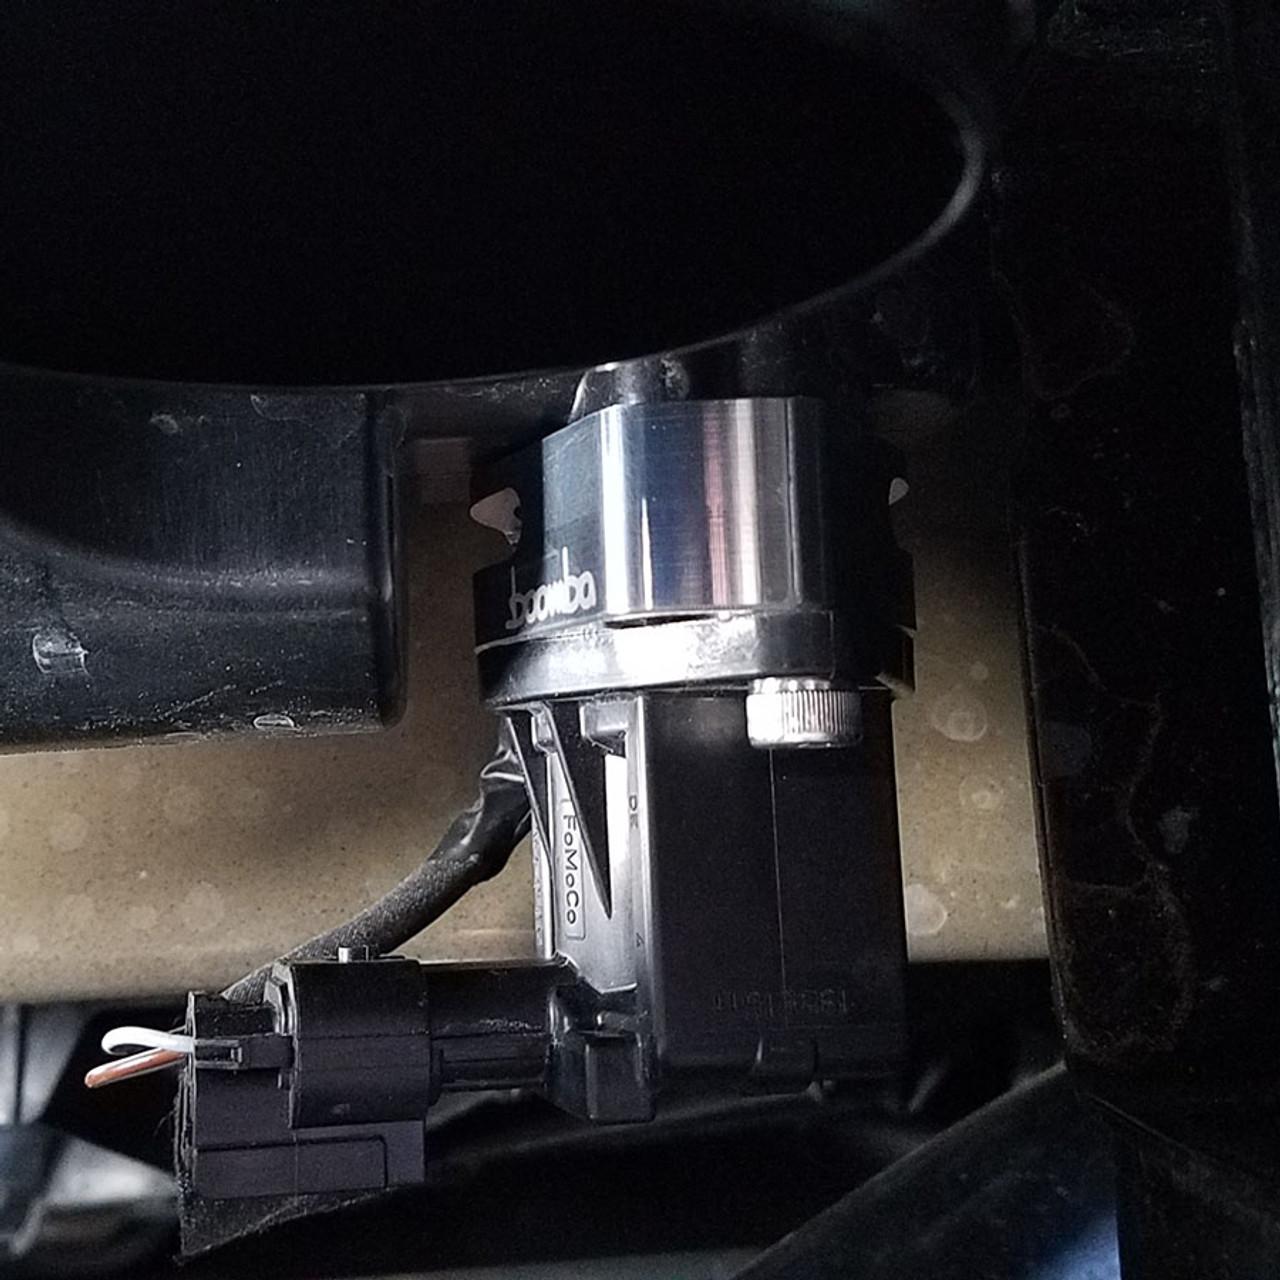 Ford Ecoboost V6 Blow Off Valve Adapter [BOVA] V2